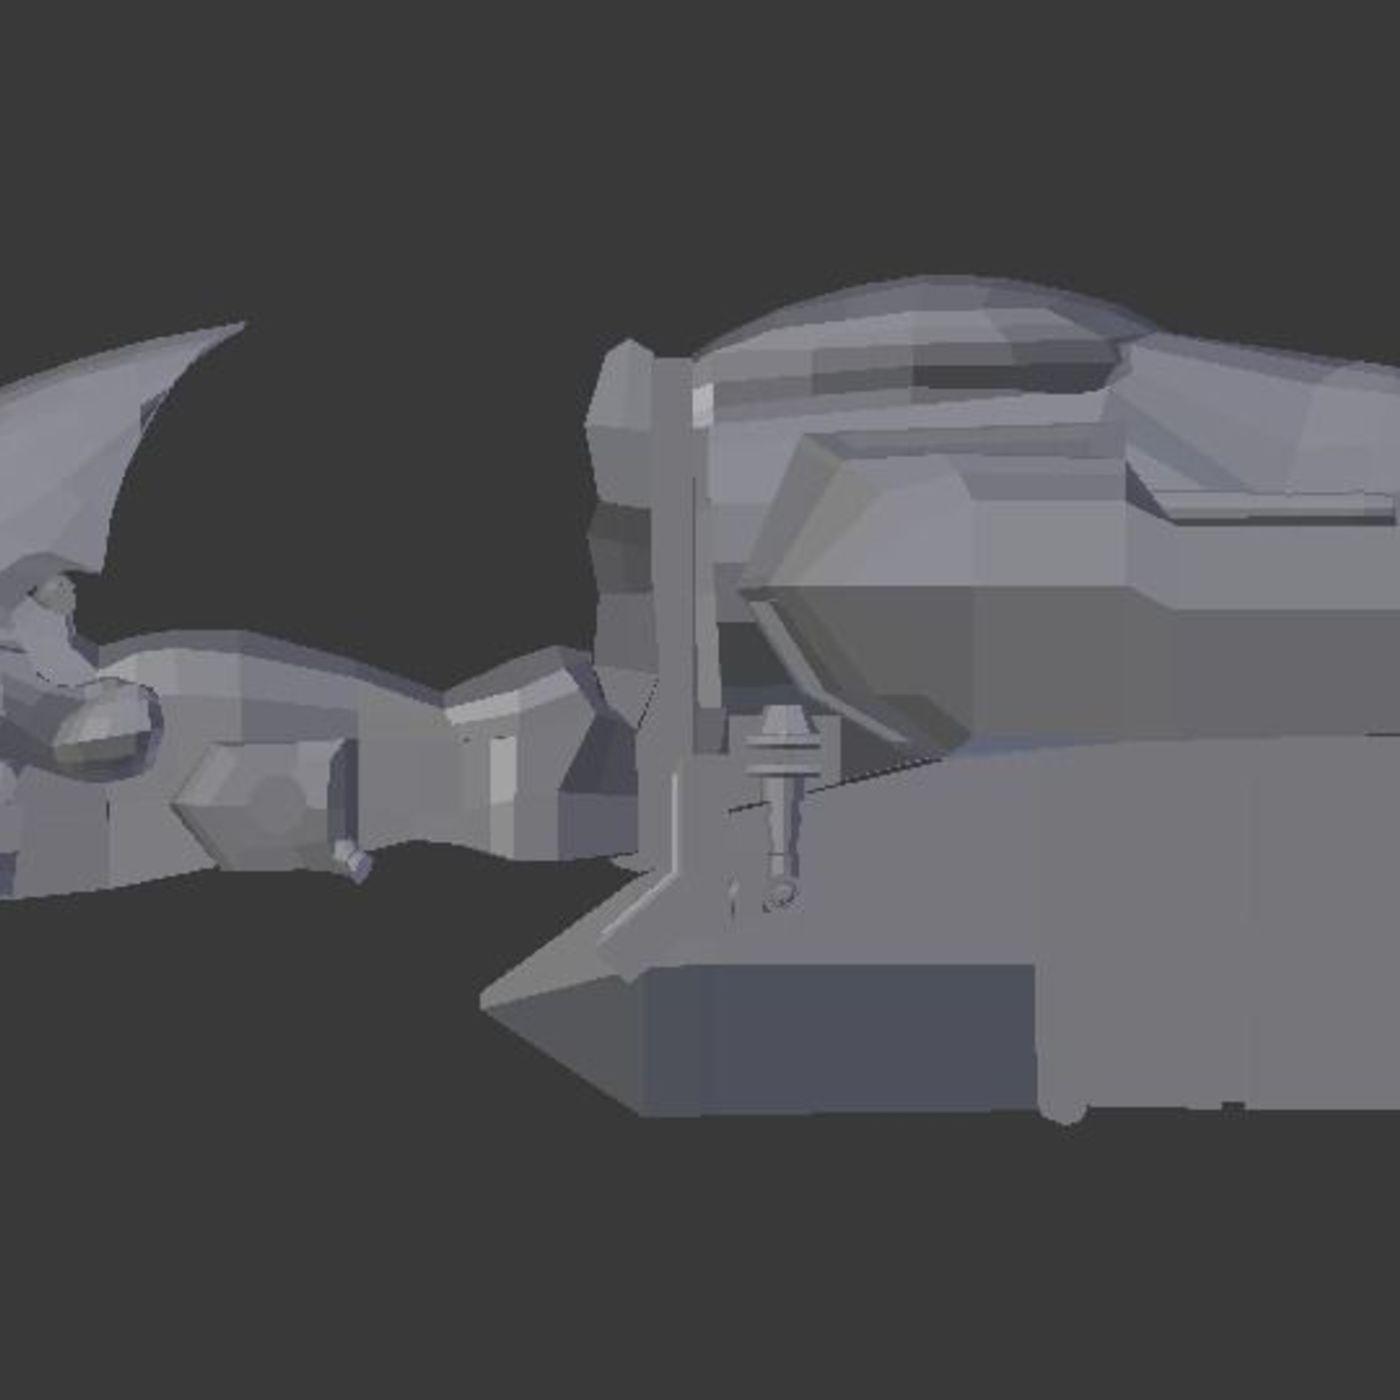 science fiction model